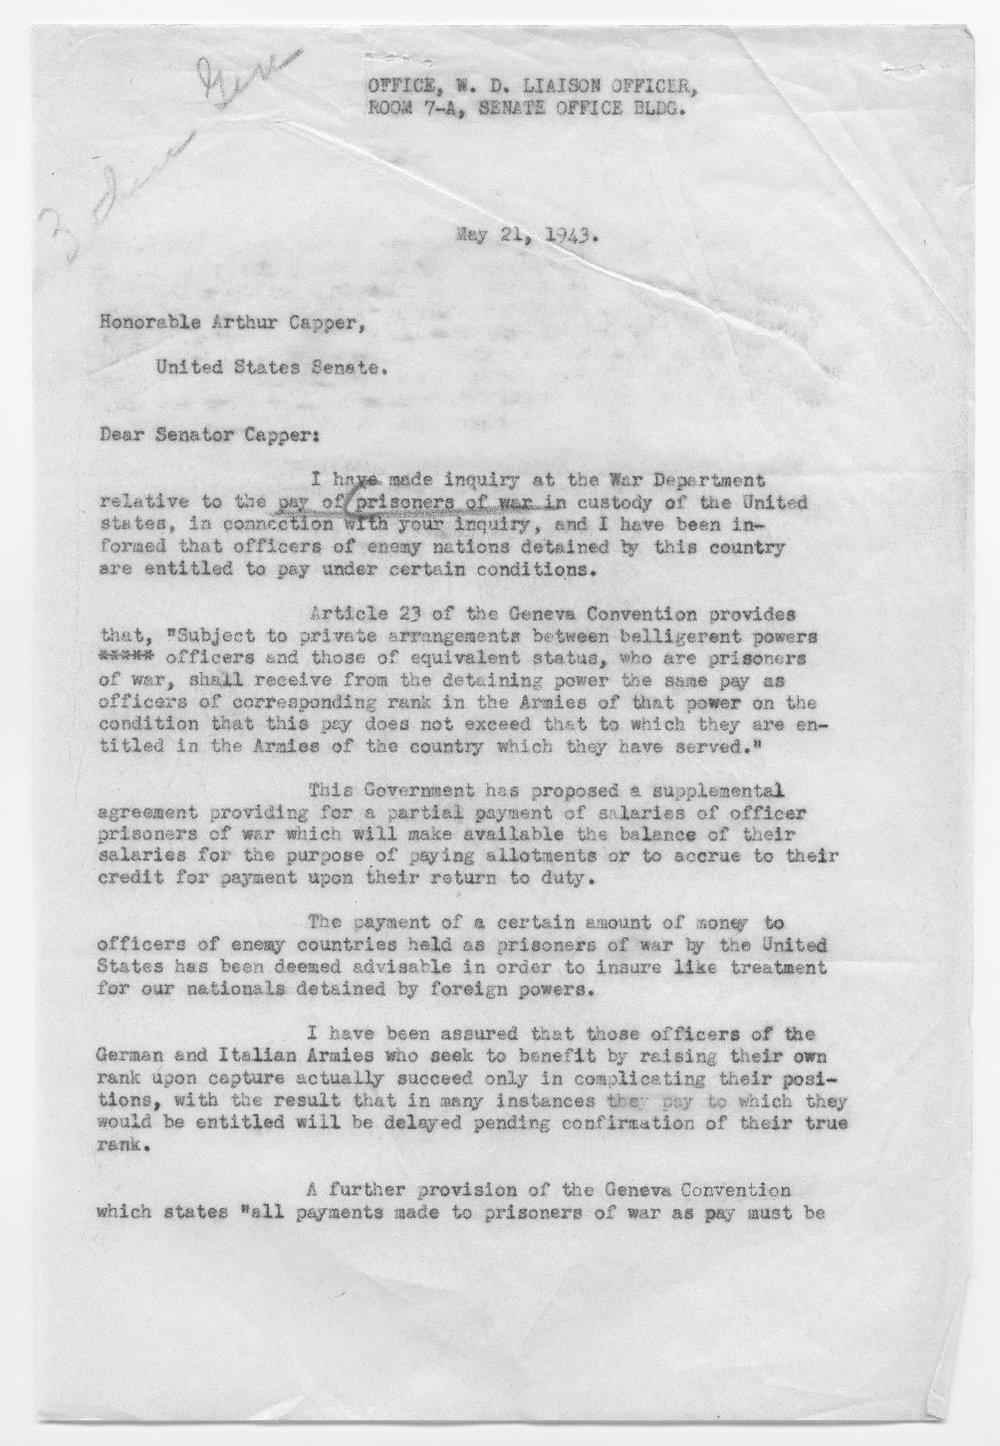 Colonel H.H. Pfeil to Senator Arthur Capper - 1